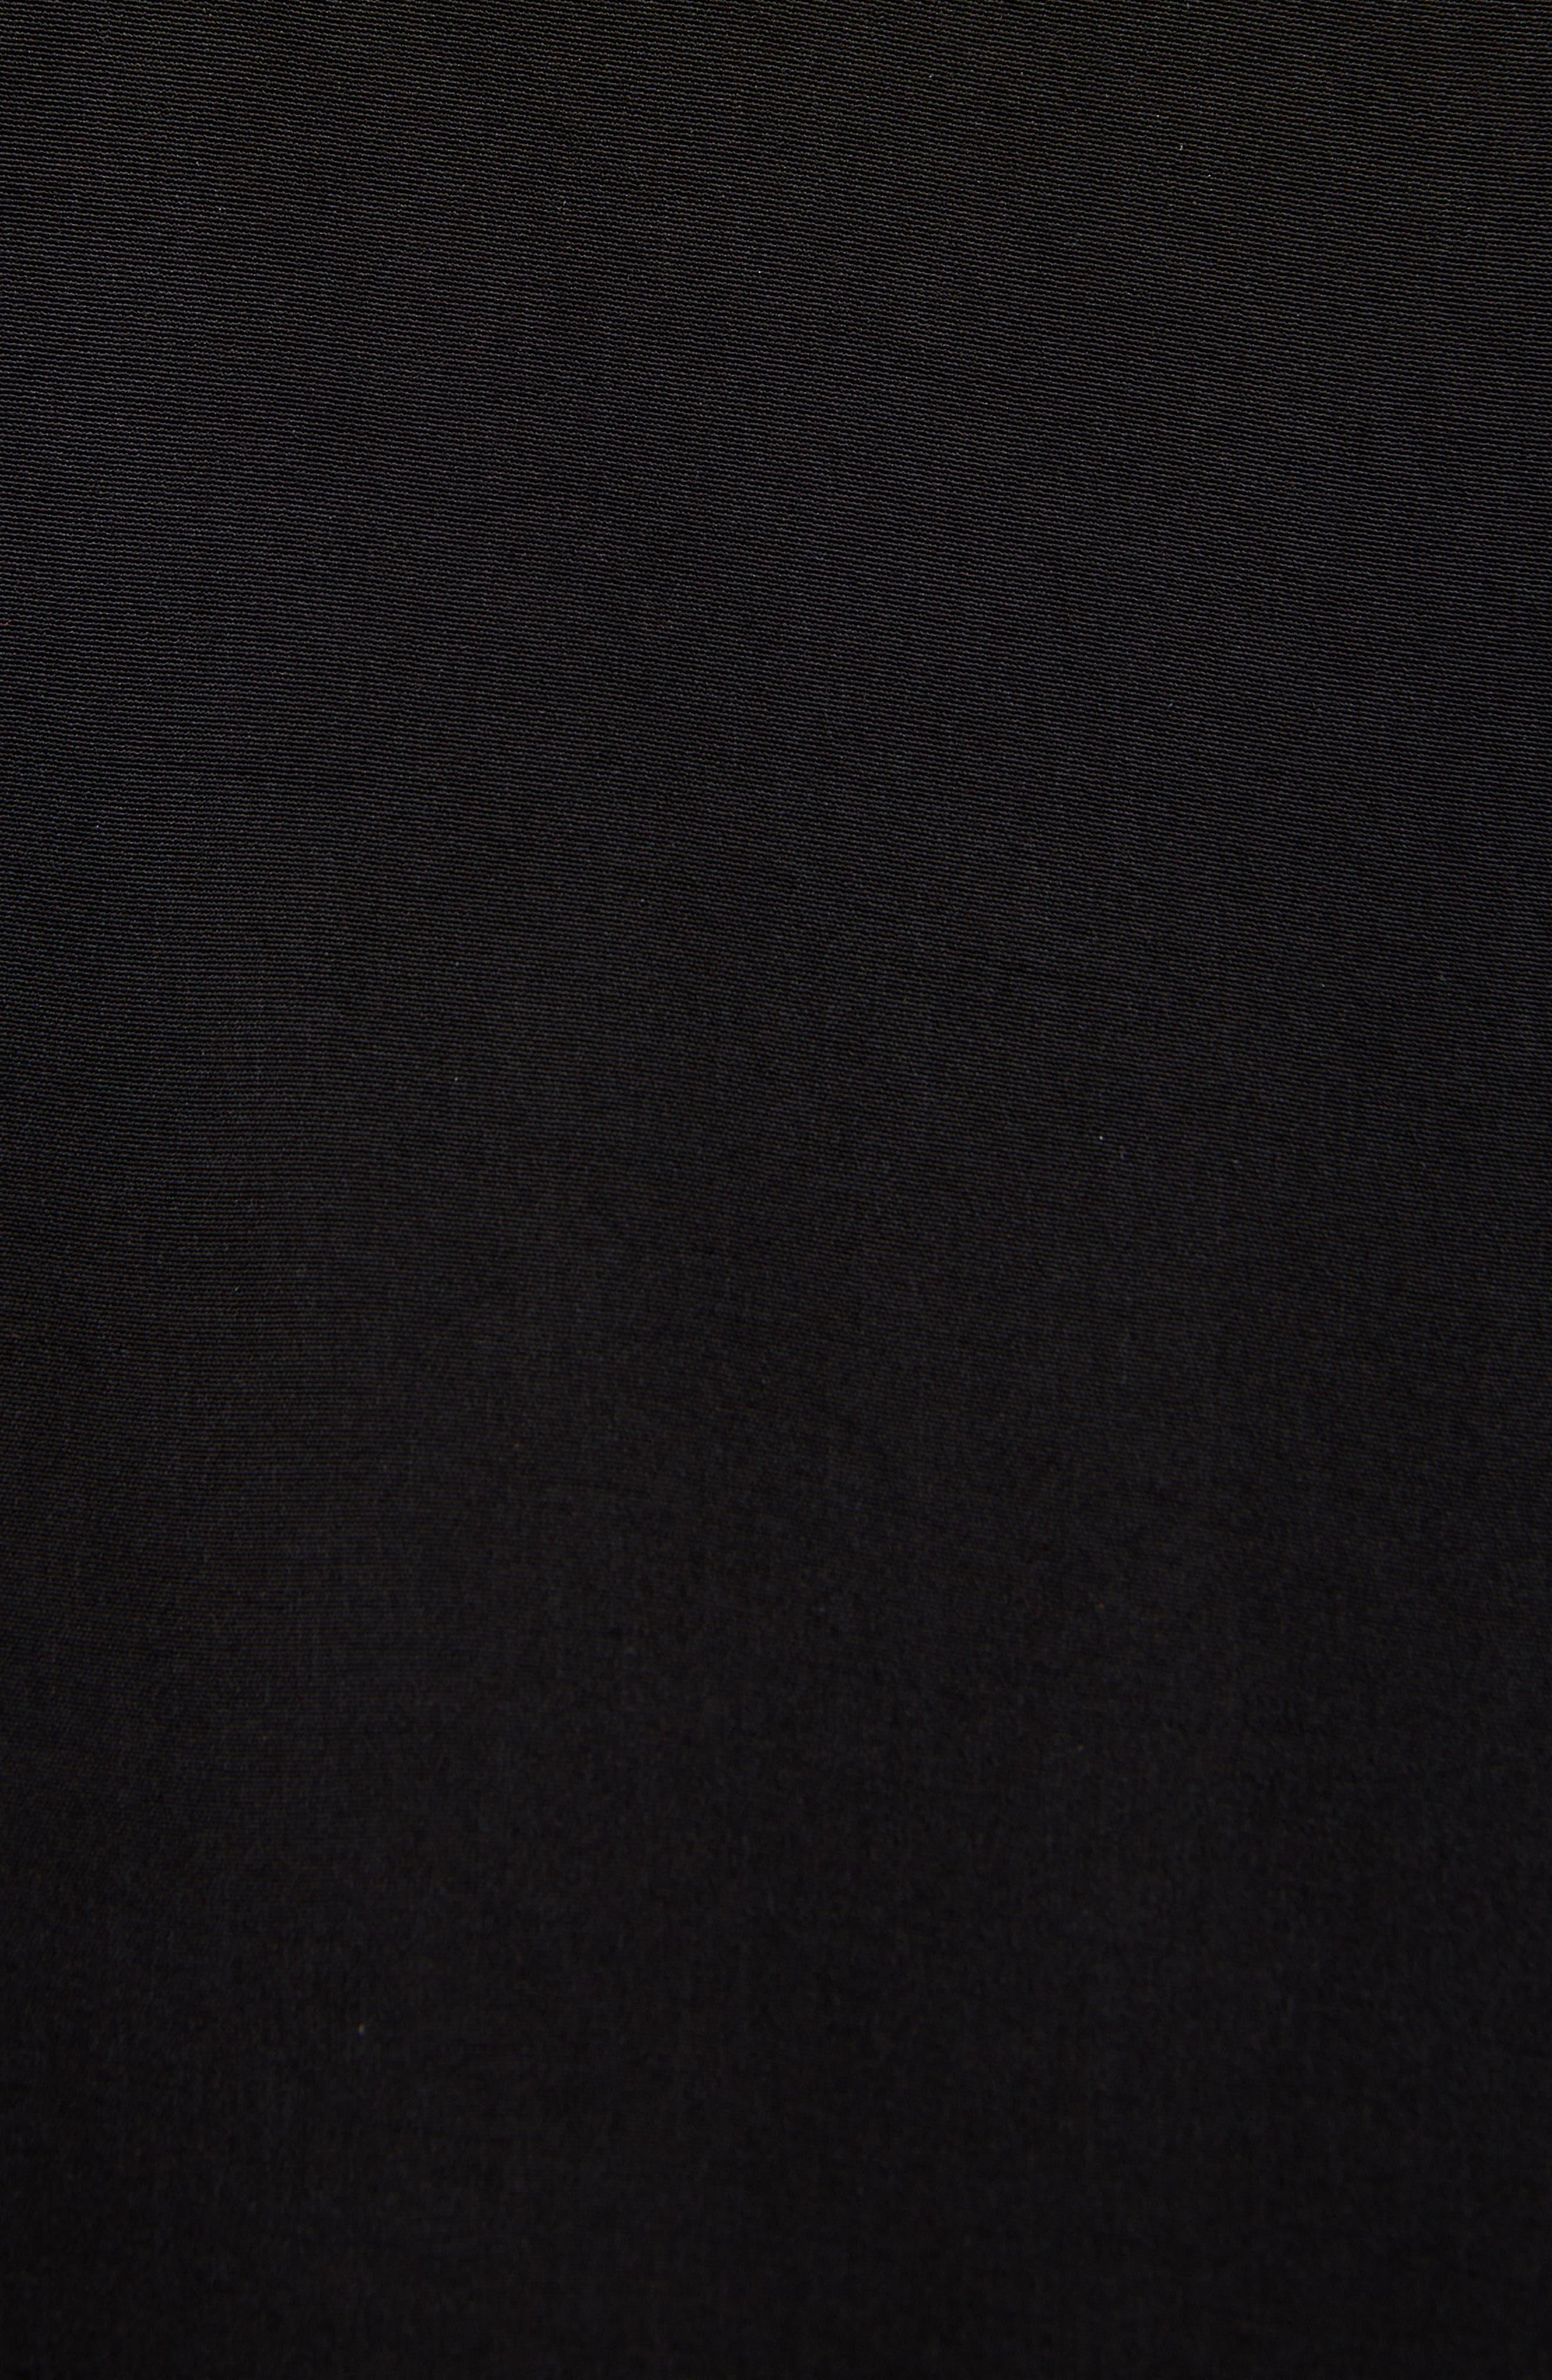 Pleat Detail Sleeveless Dress,                             Alternate thumbnail 5, color,                             BLACK